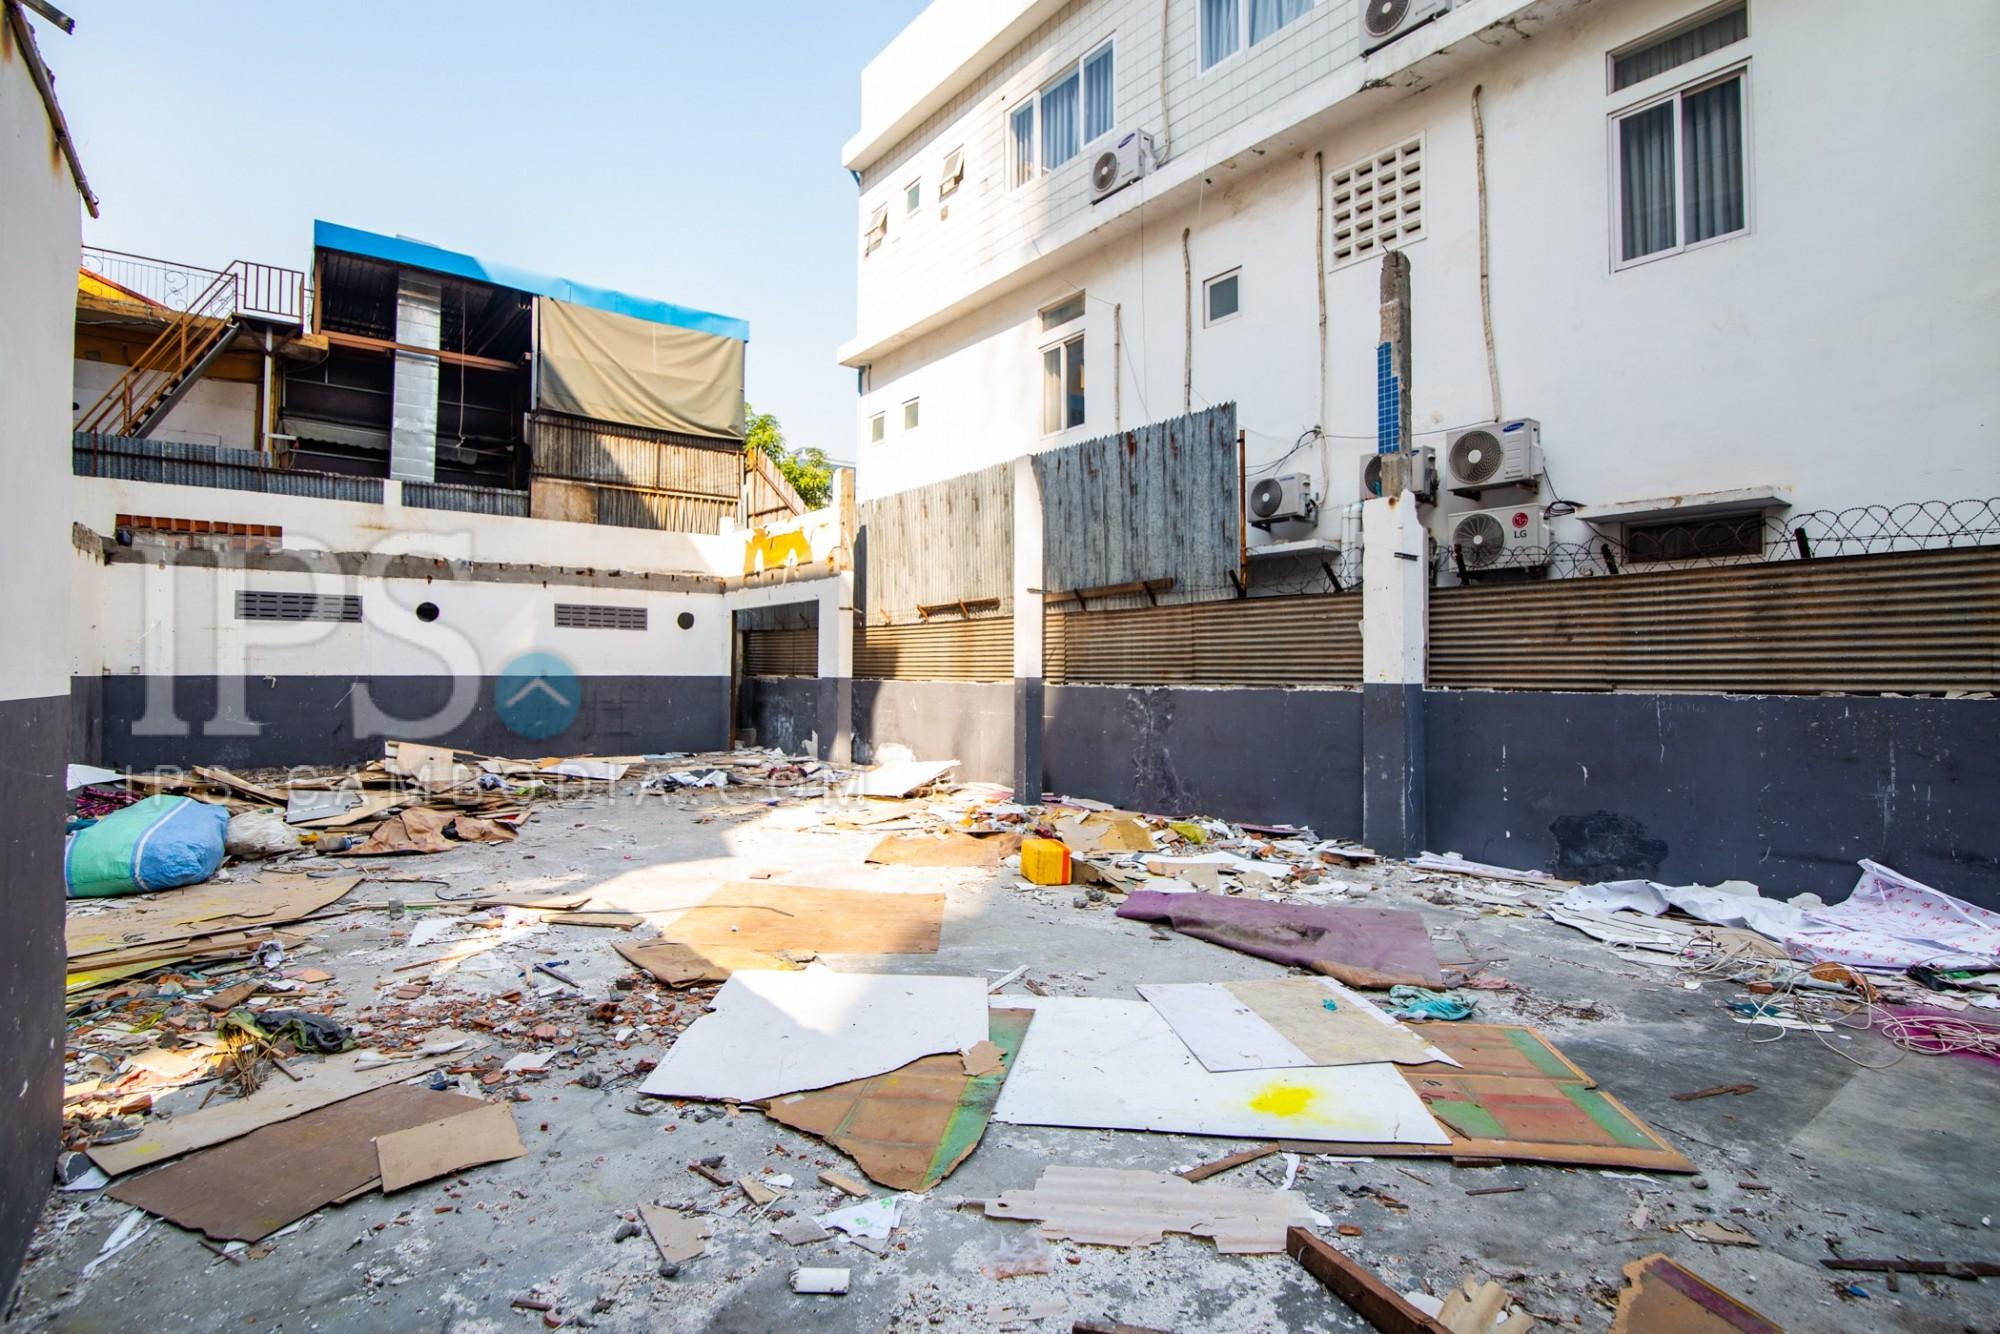 252 Sqm Land For Rent - Boeung Prolit, Phnom Penh